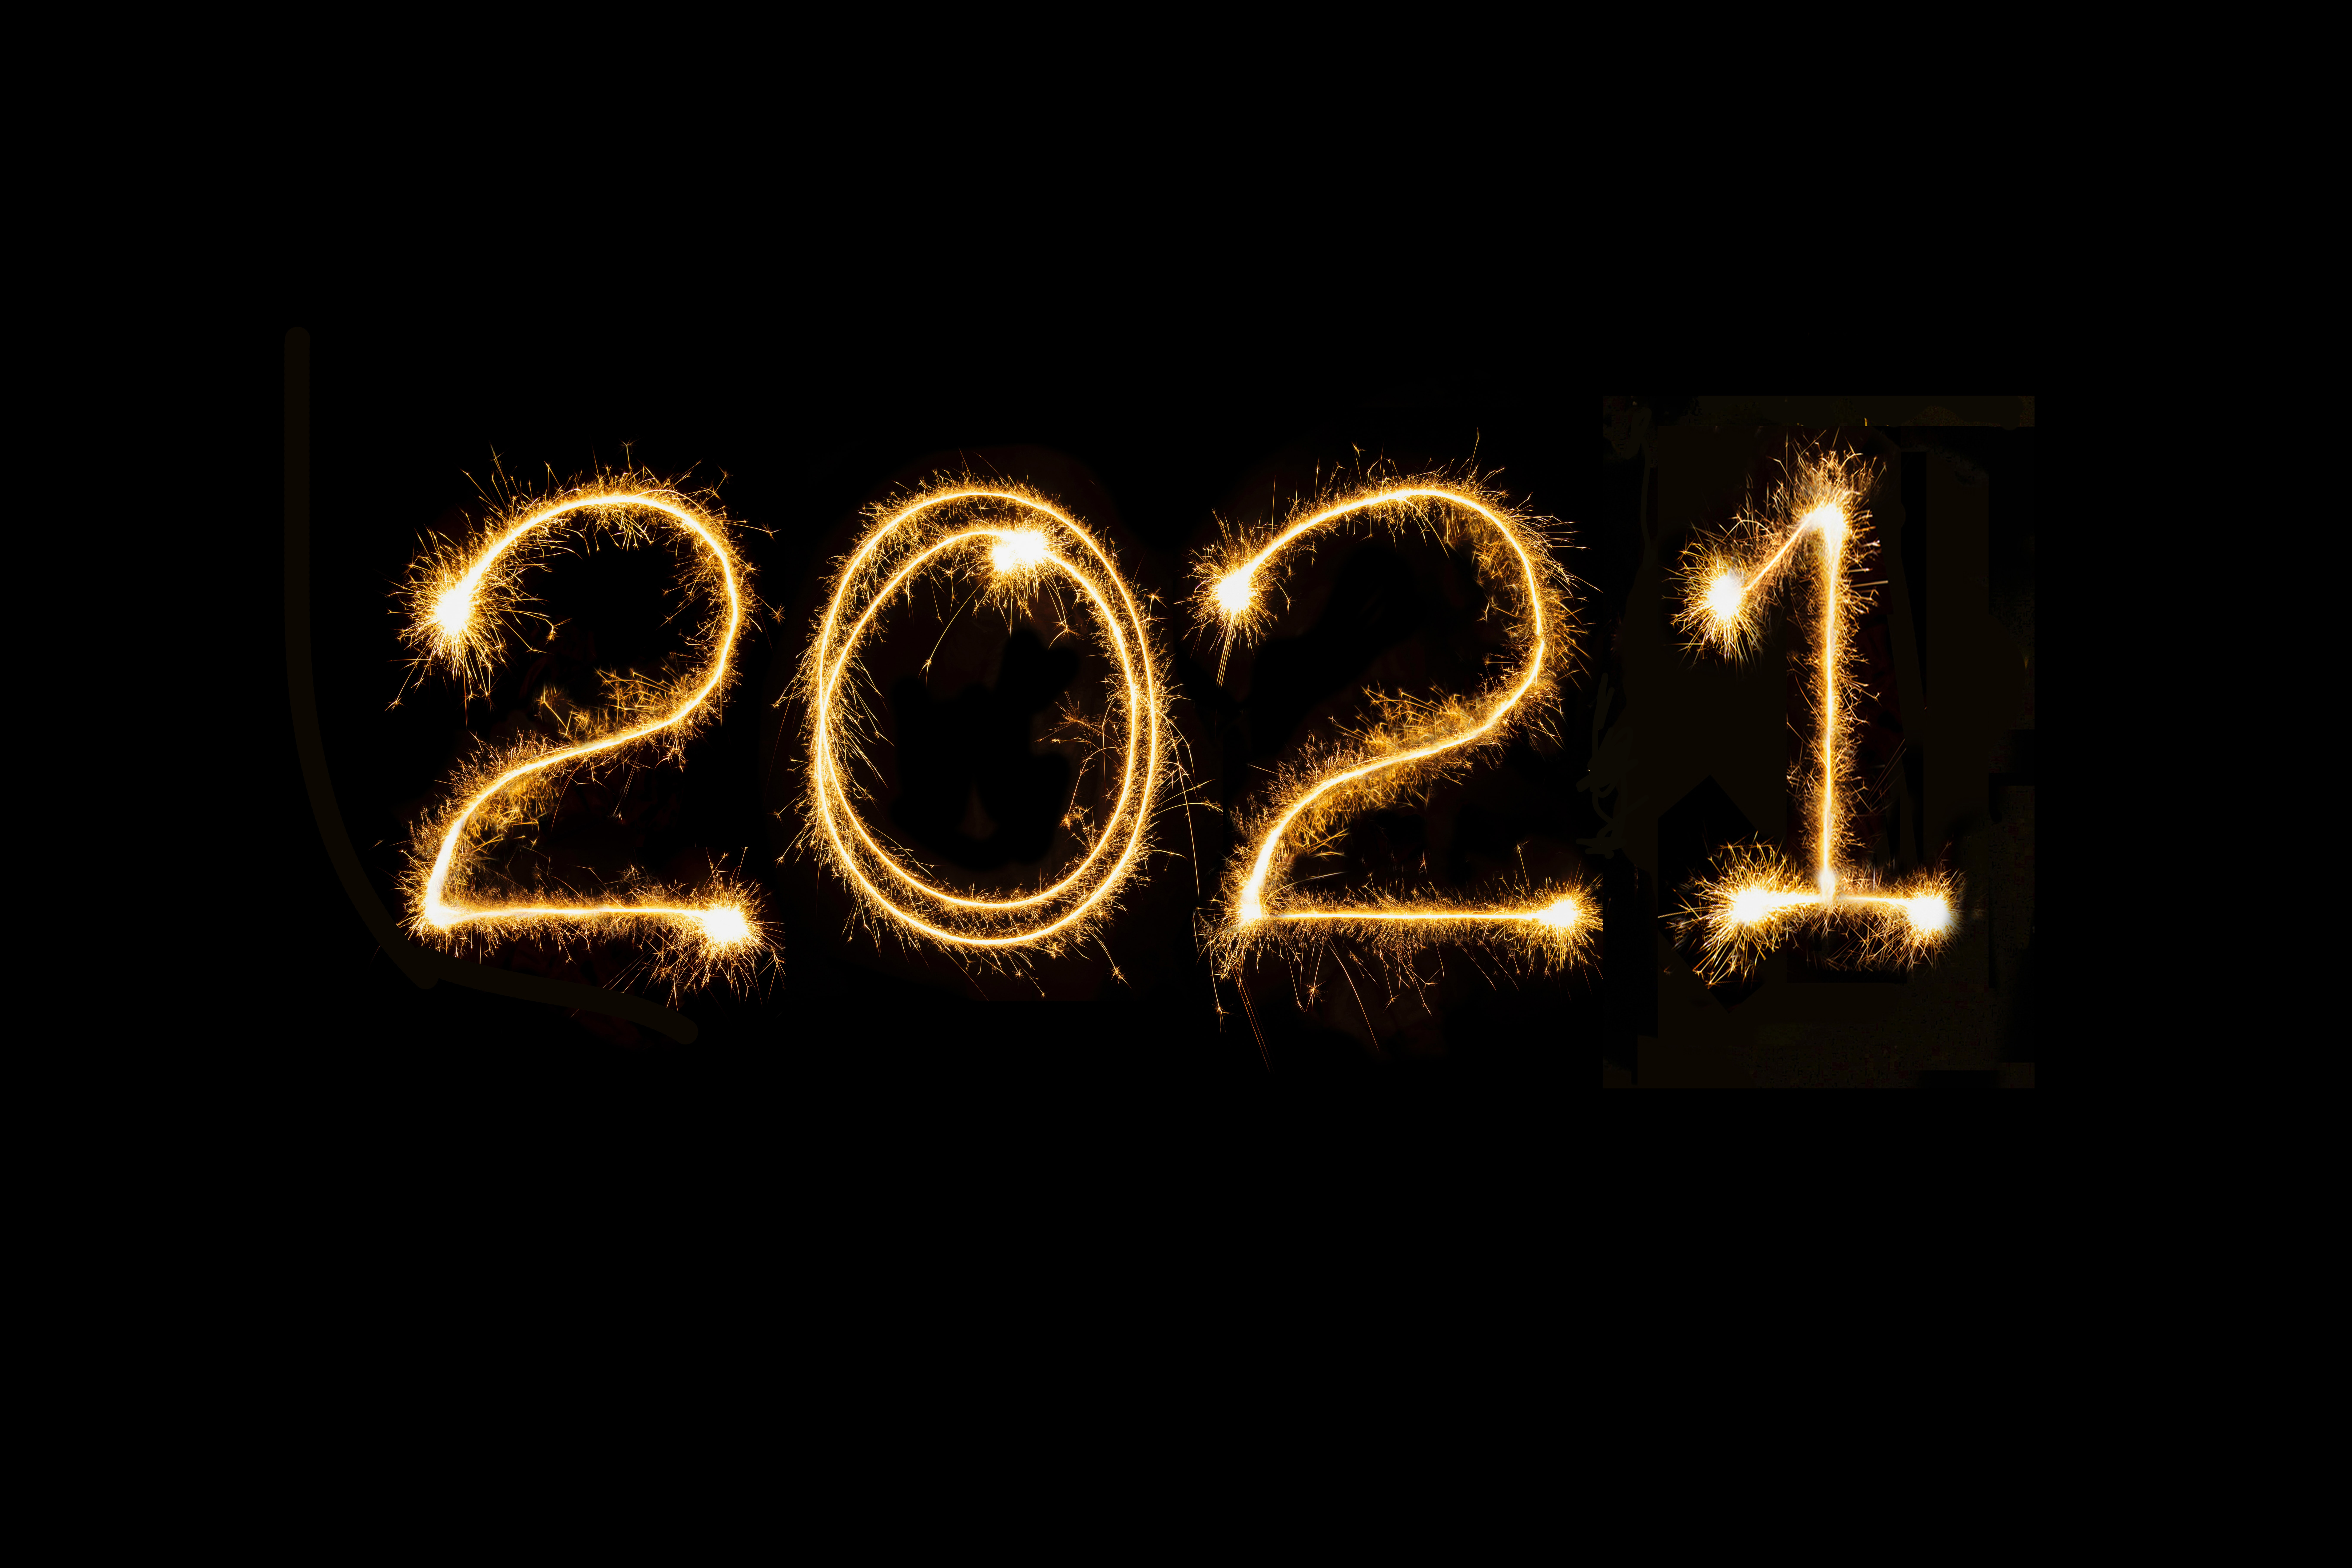 2021 (Photo by Jude Beck on Unsplash)